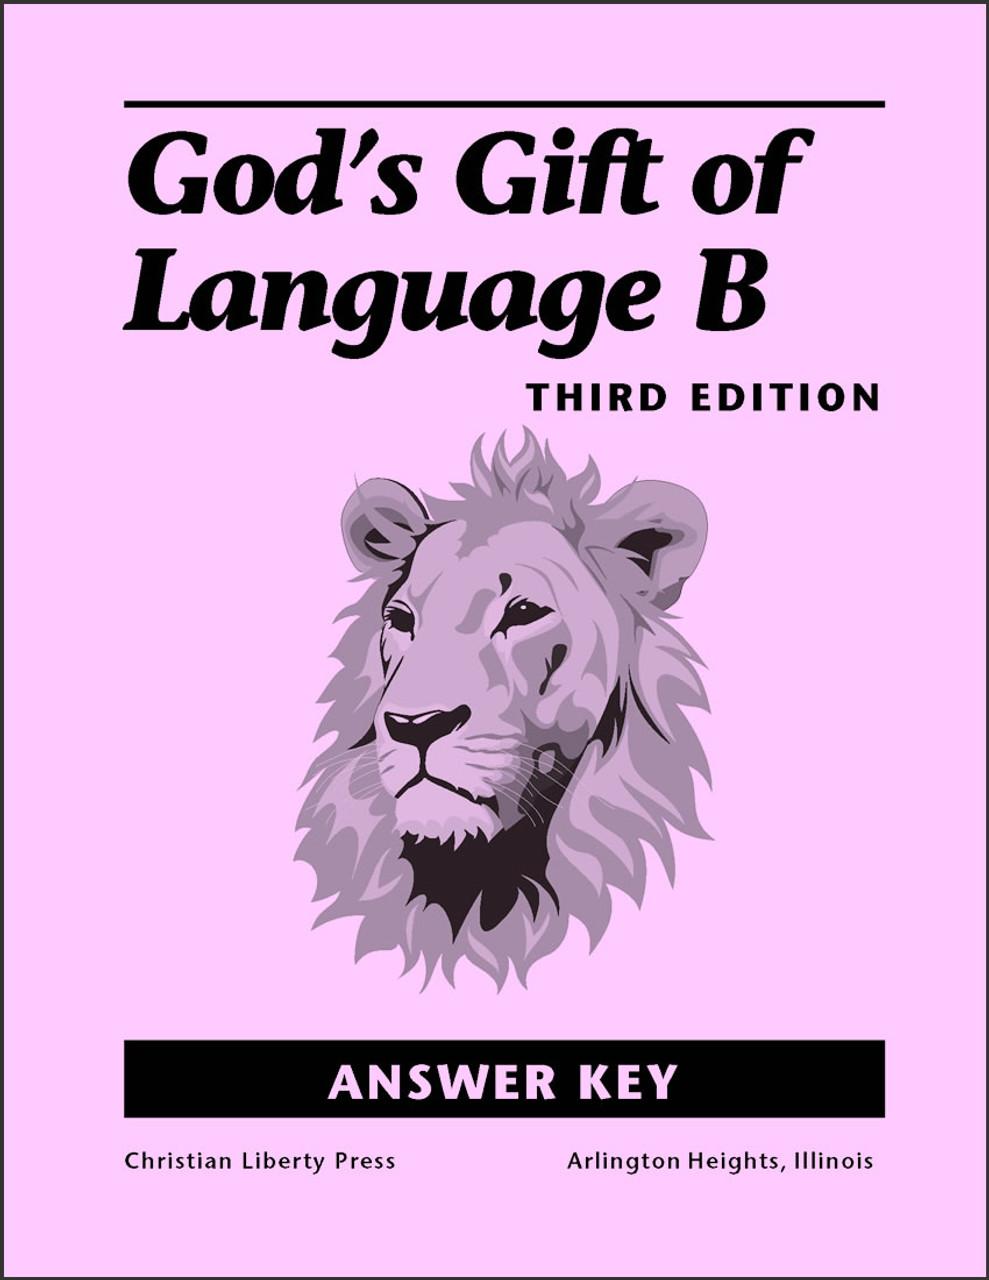 God's Gift of Language B, 3rd edition - Answer Key